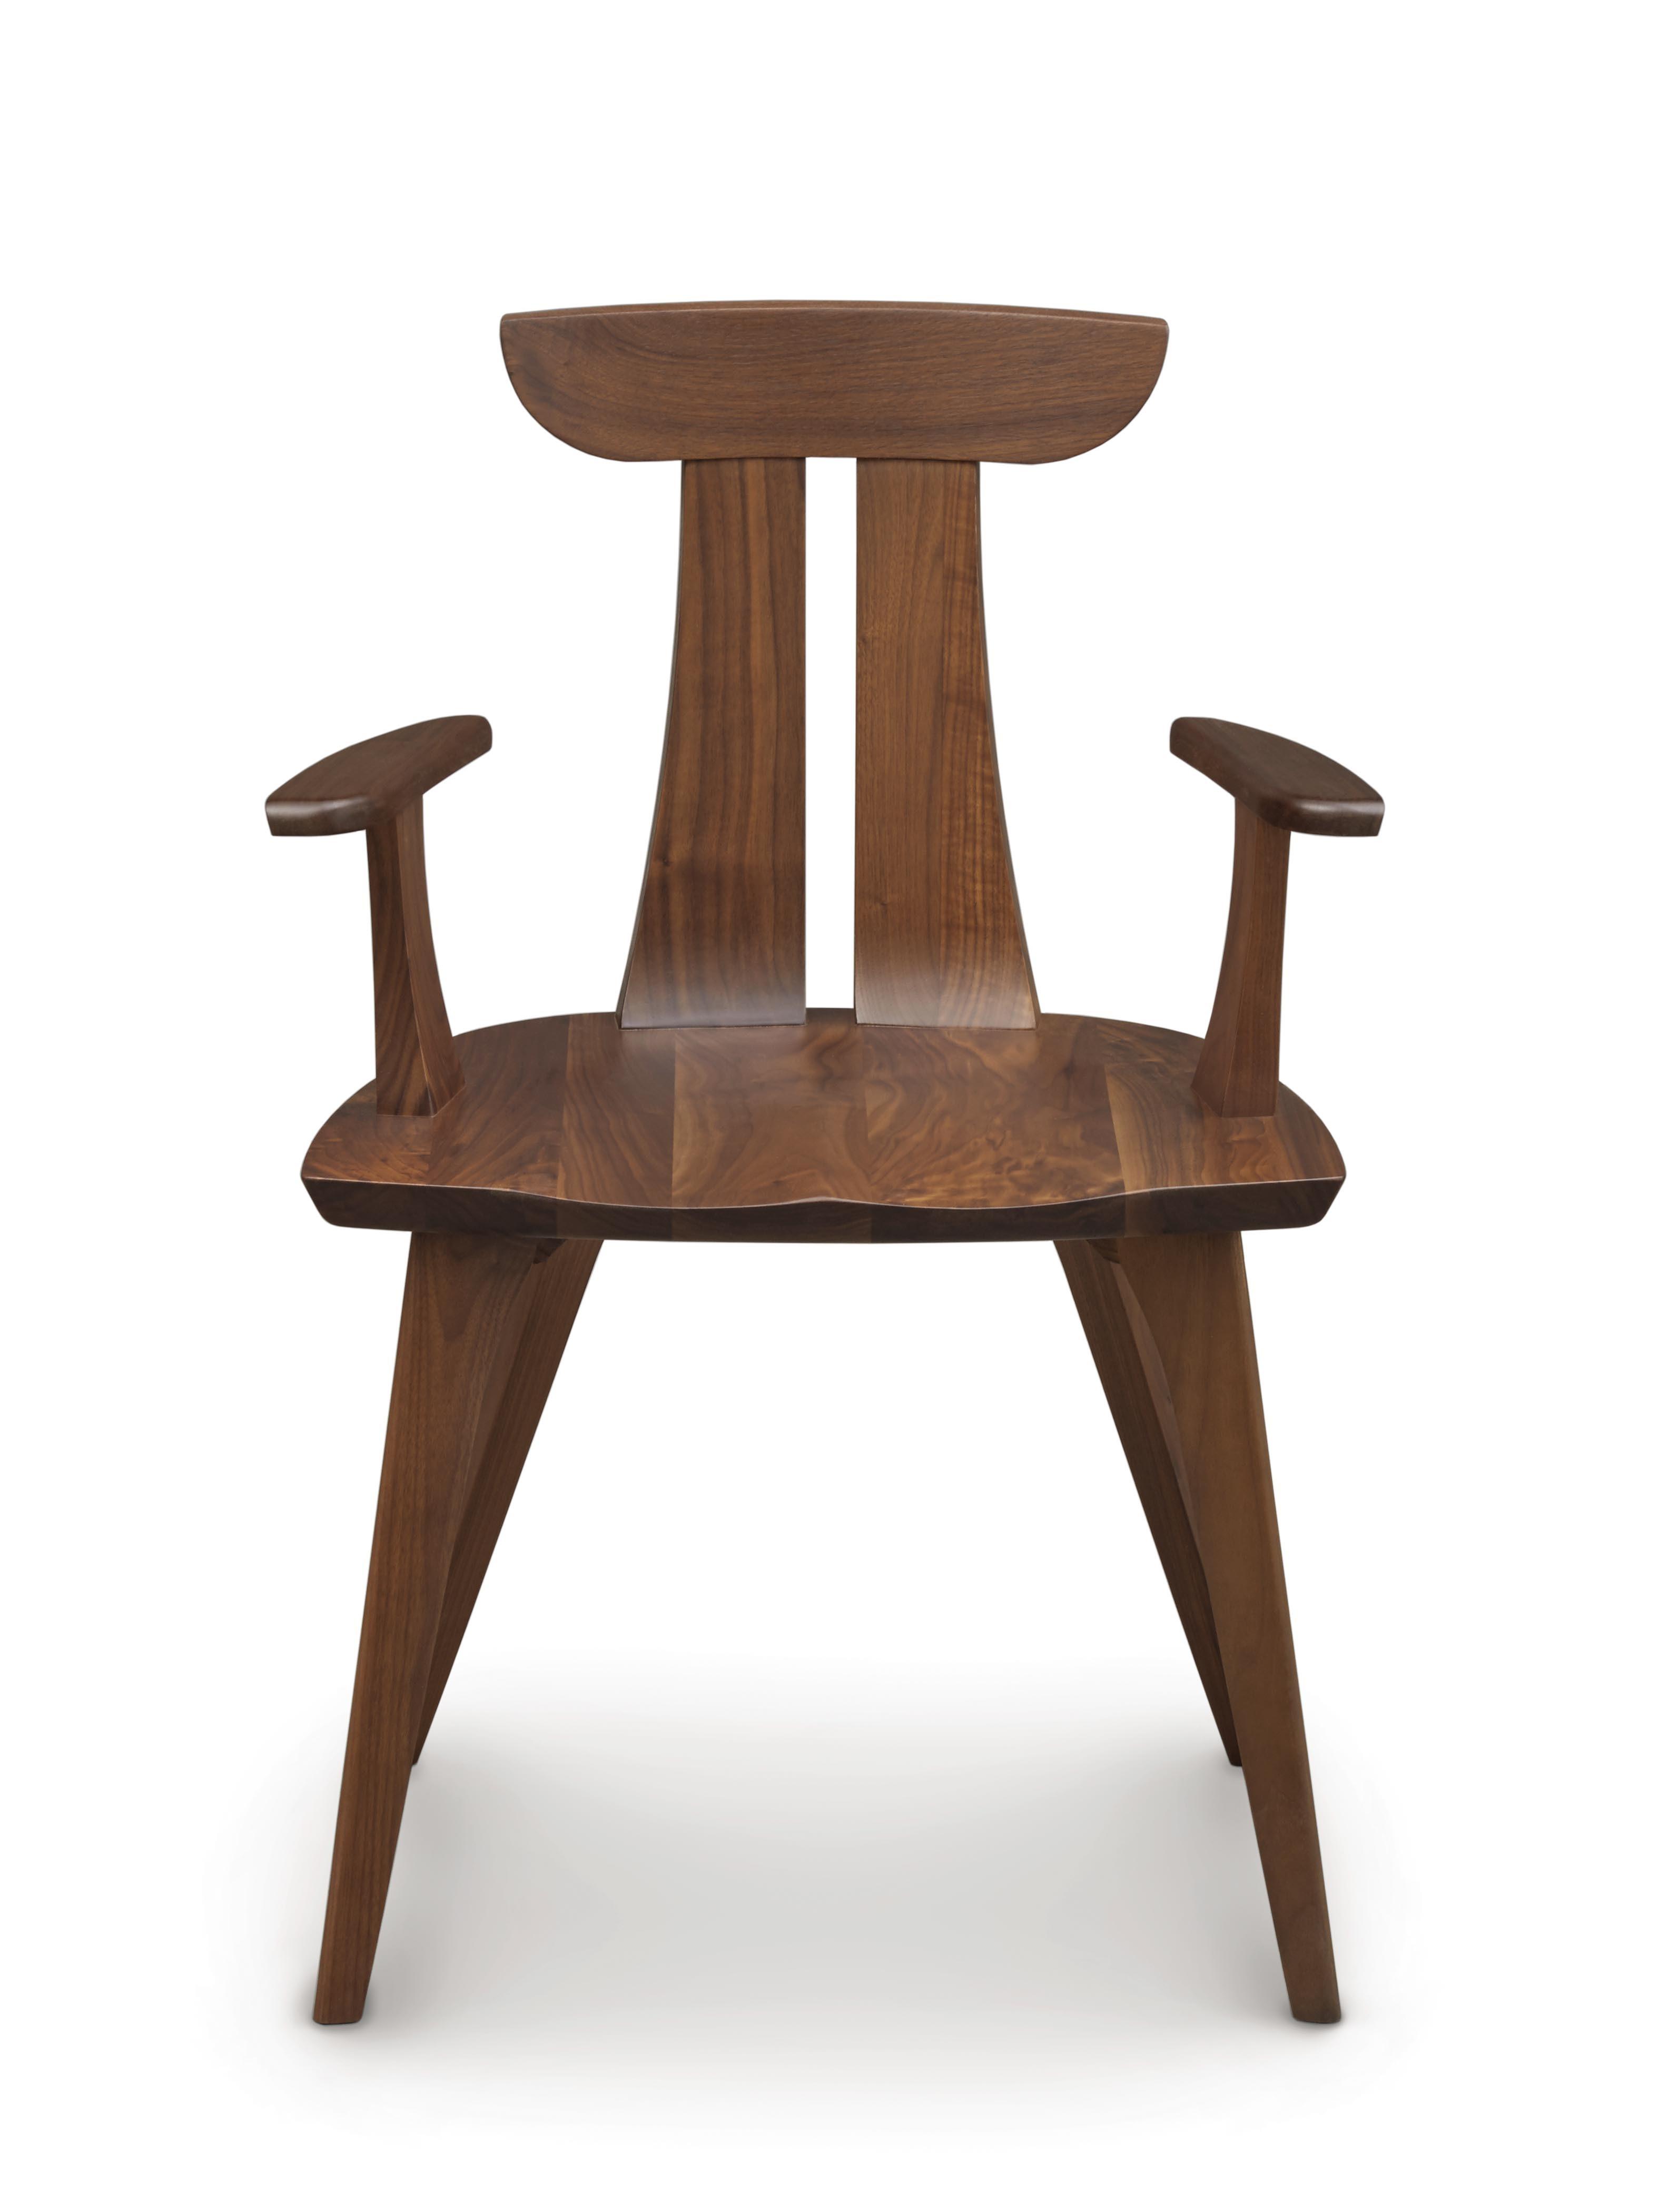 Estelle David Chase Furniture And Design